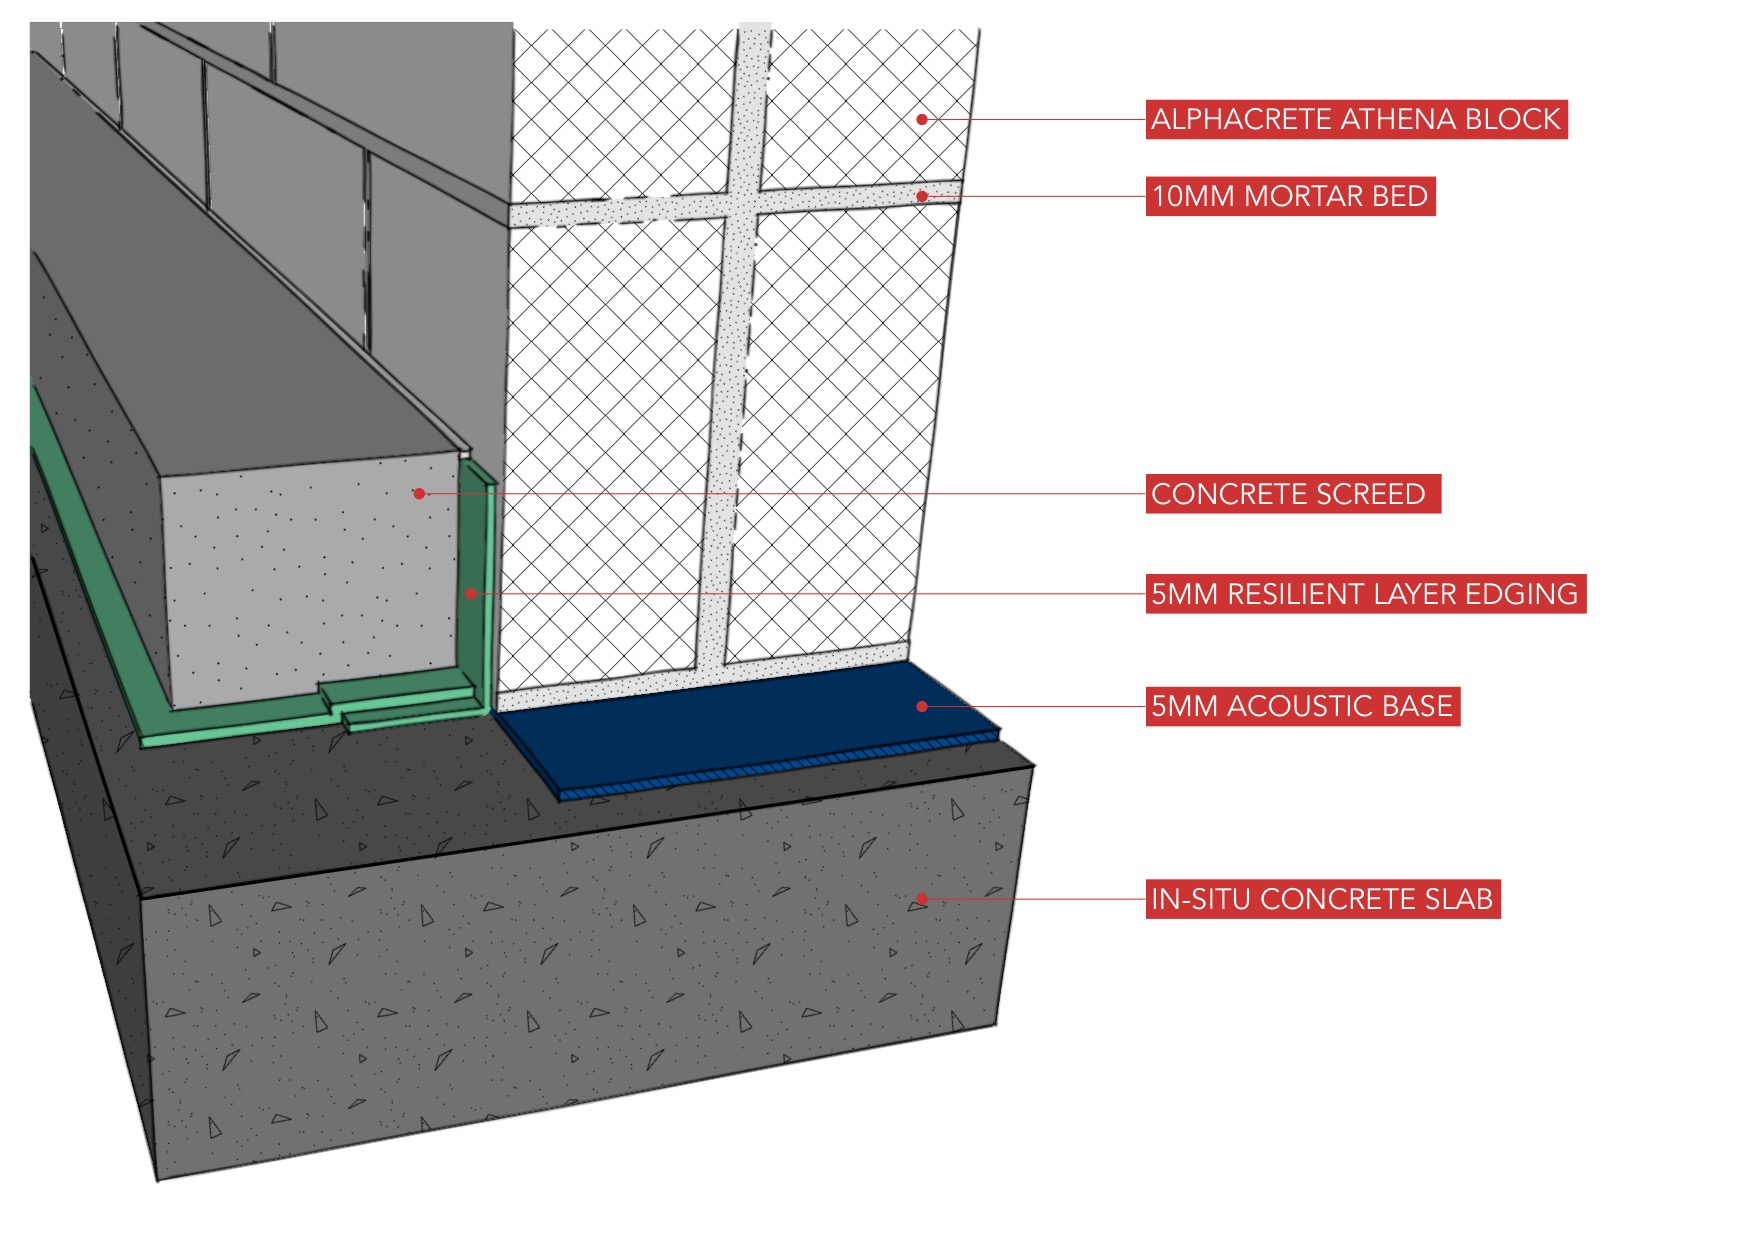 Detail showing elemental blockwork construction